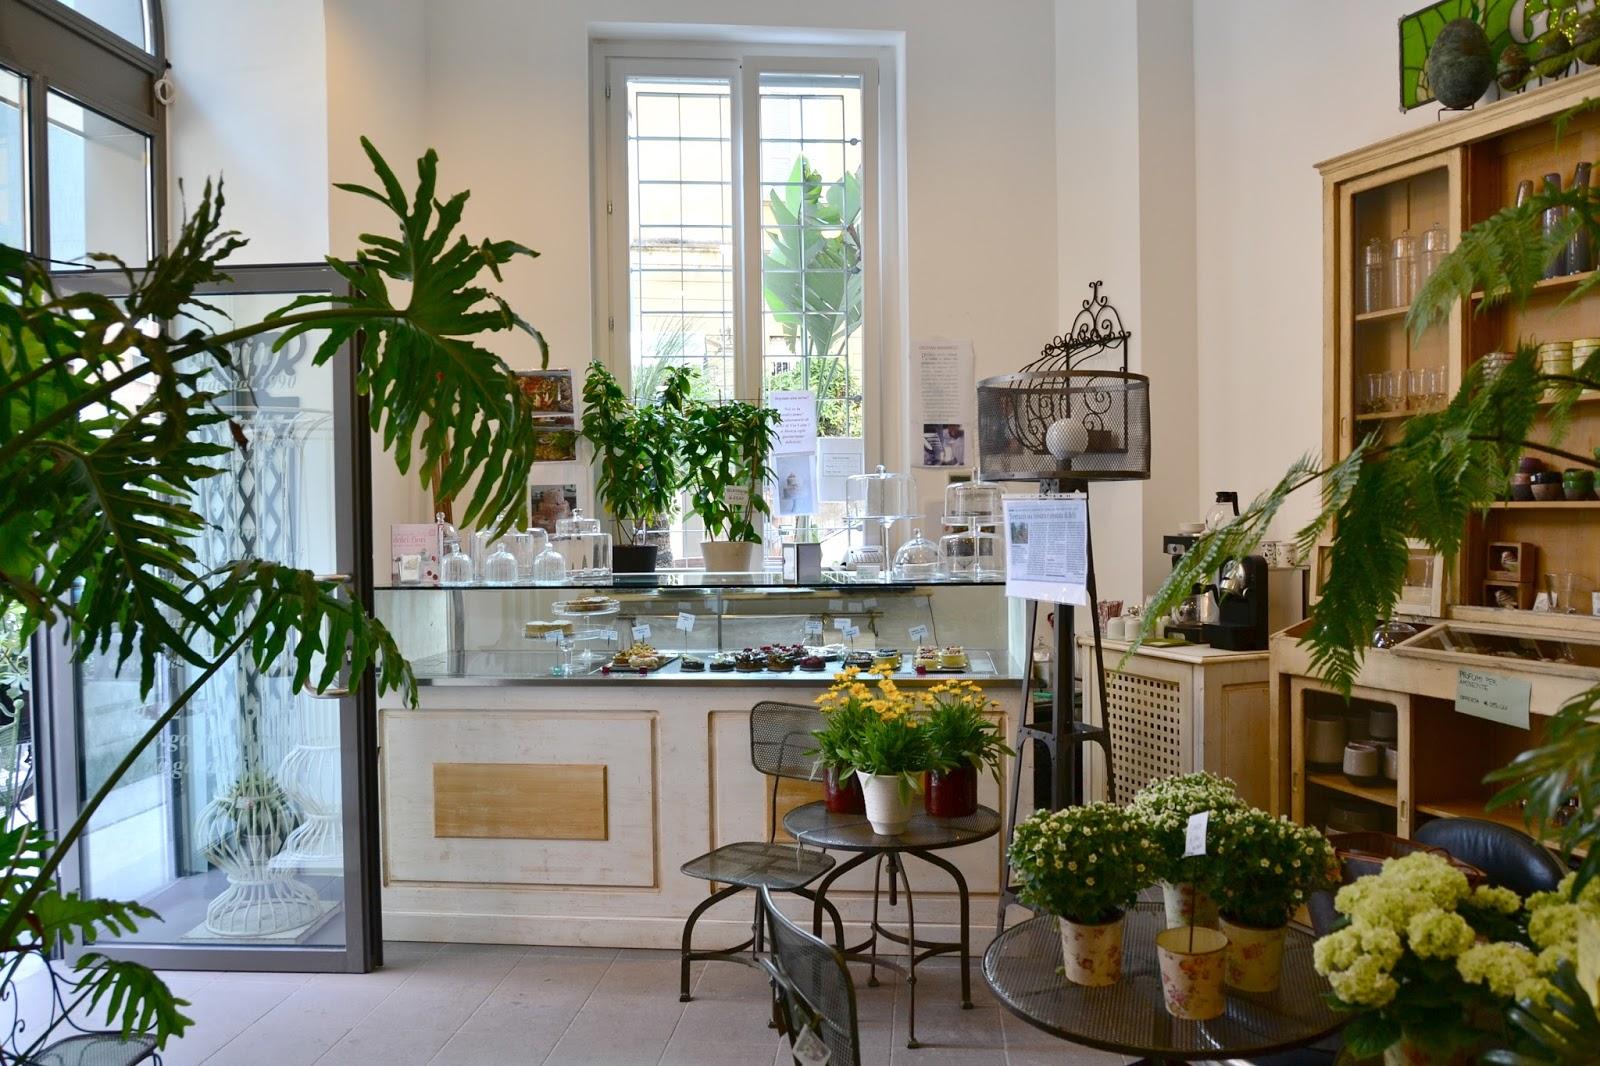 Shabby chic interiors - Gardenia pianta da giardino ...